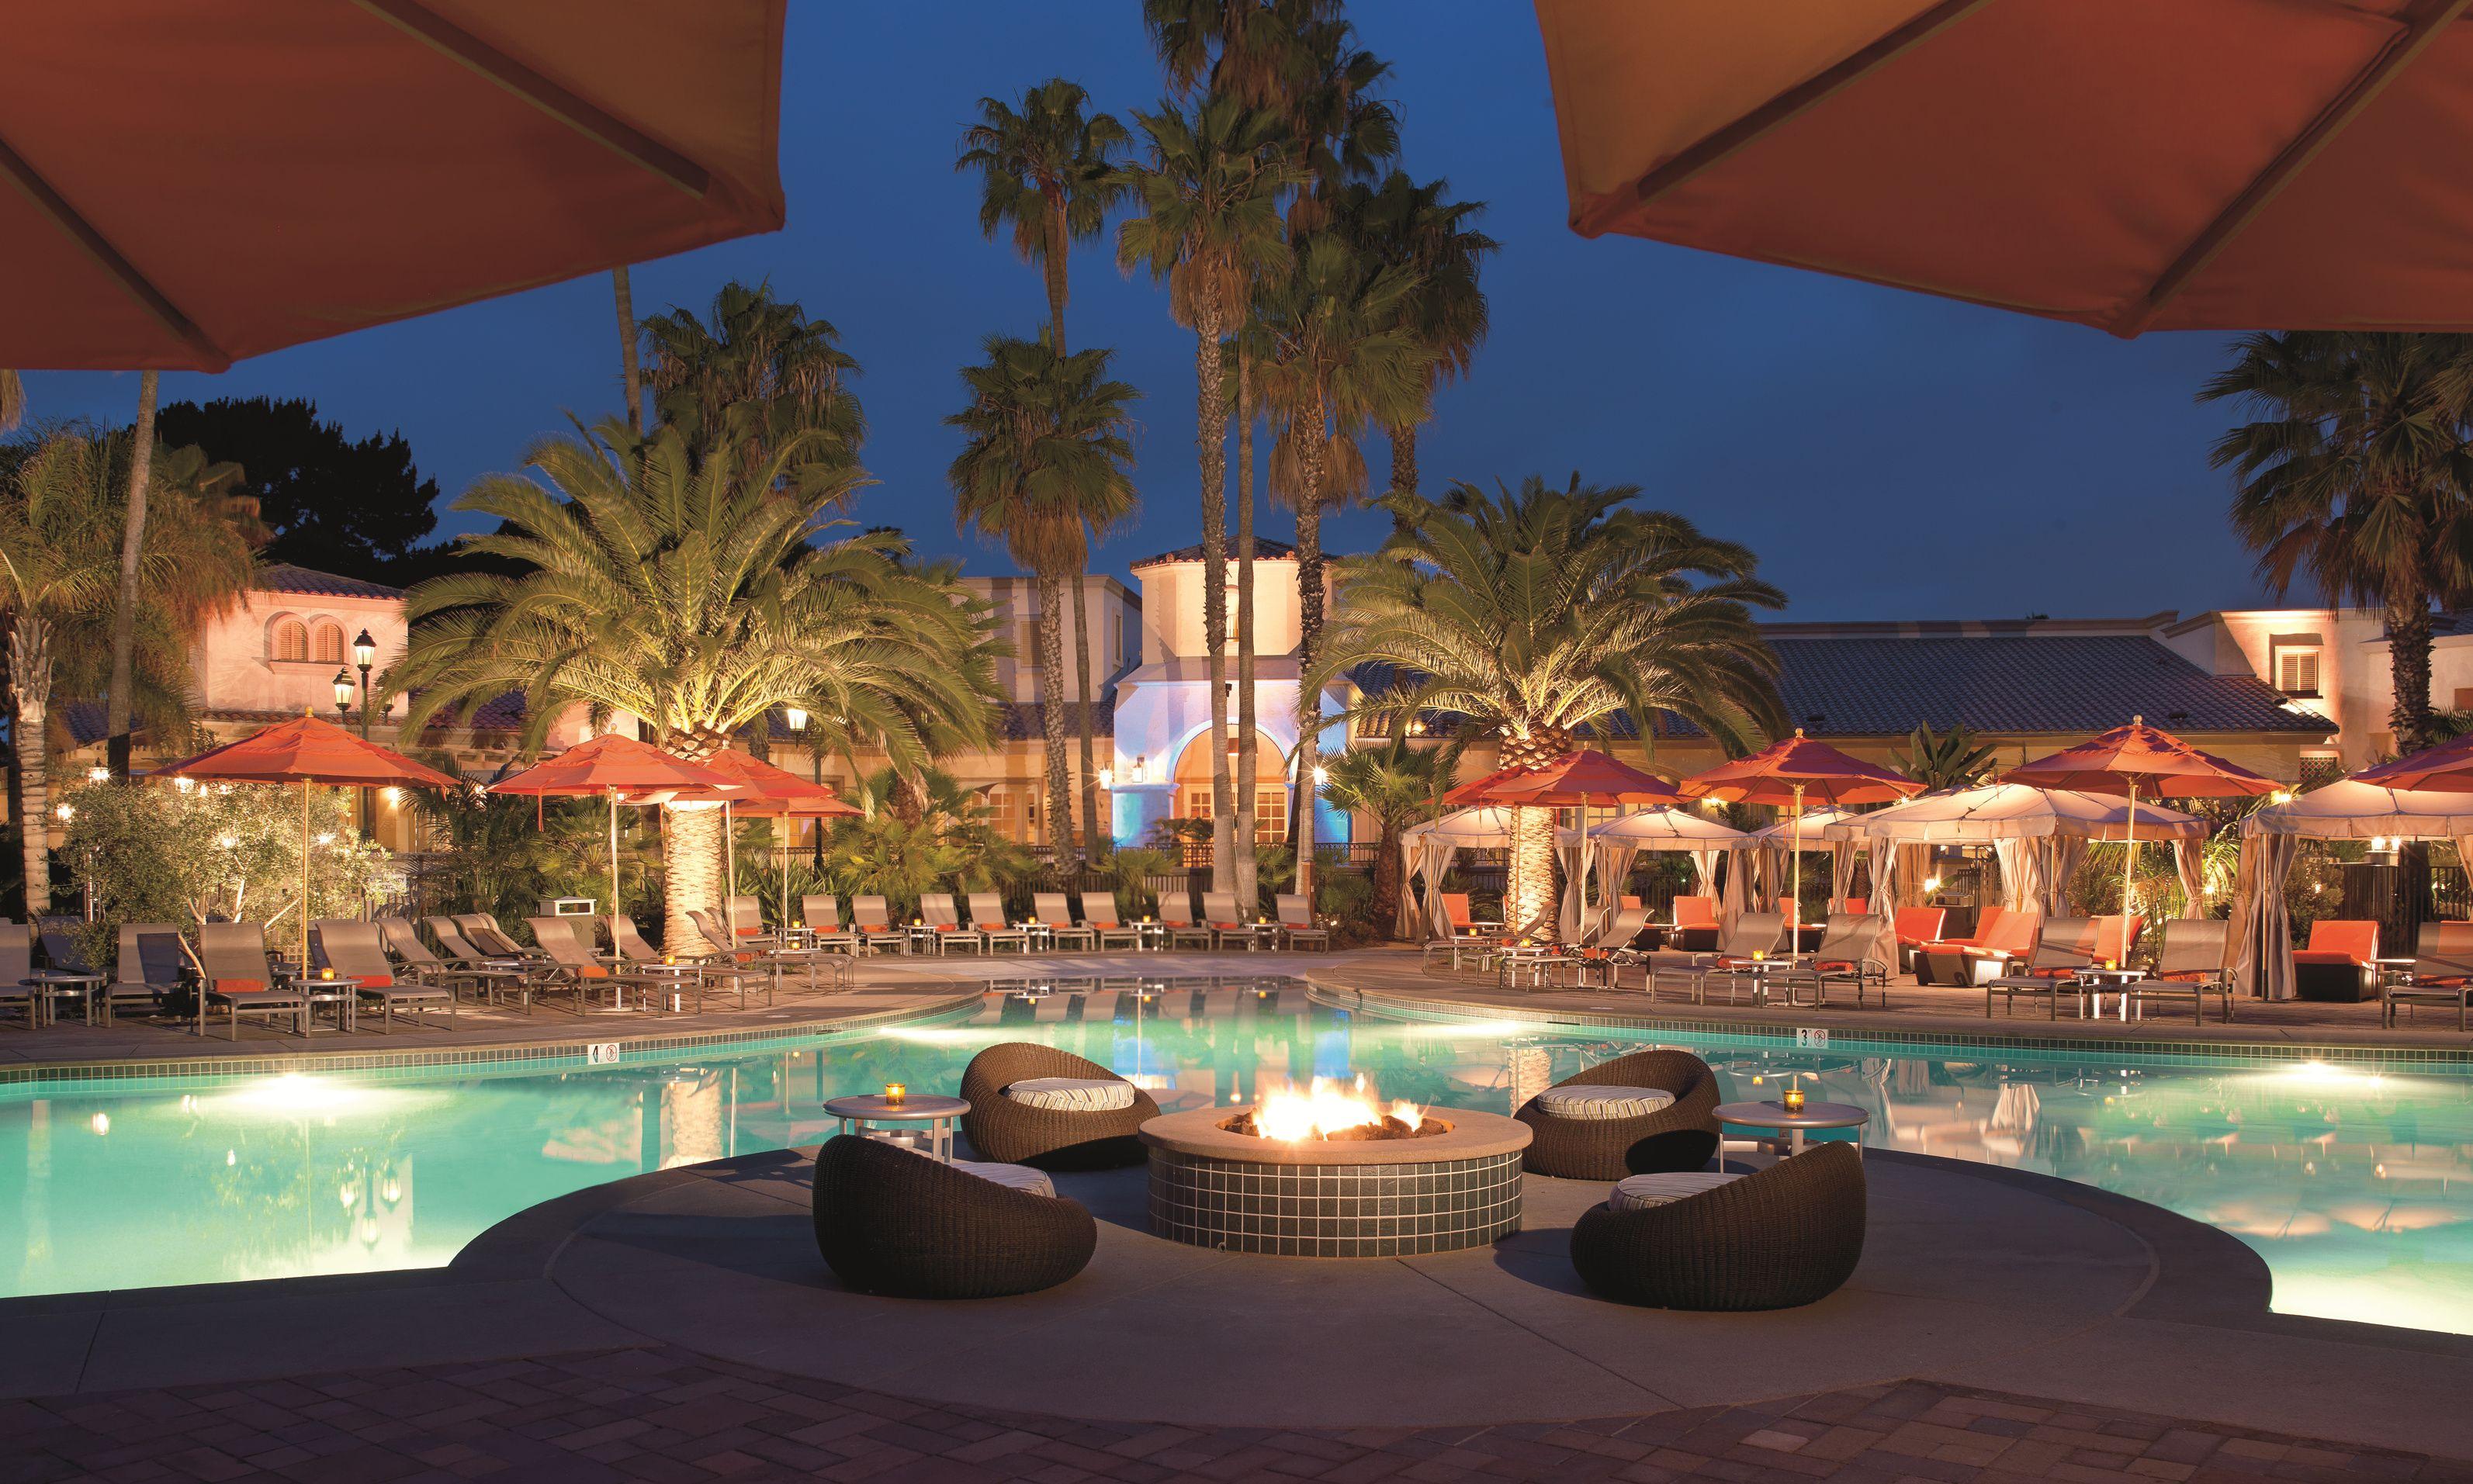 Hilton San Diego Resort - Fire Pit by the Pool | Hilton ...